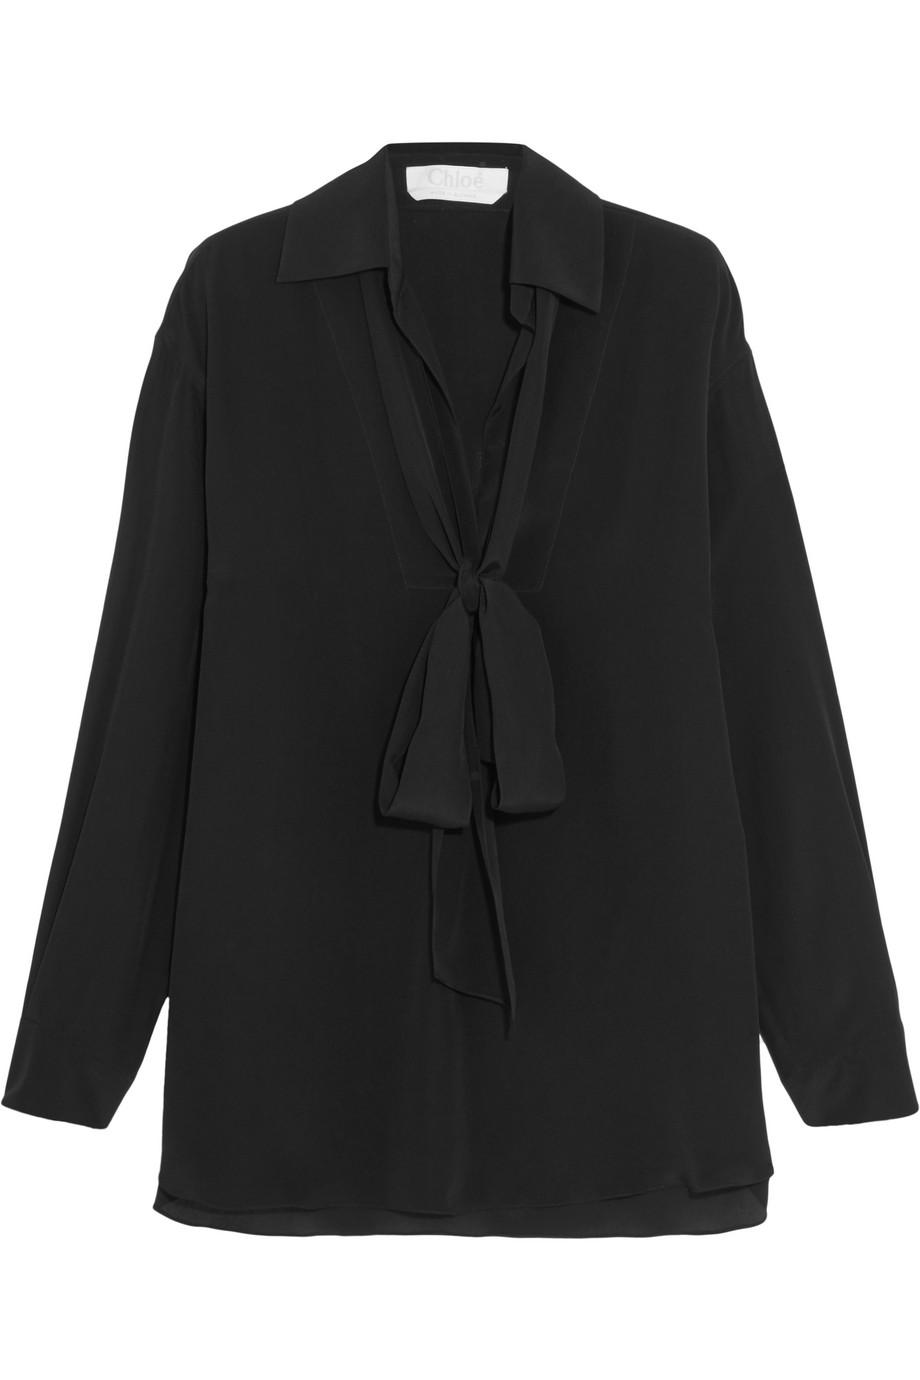 Chloé Pussy-Bow Silk-Cady Blouse, Black, Women's, Size: 34